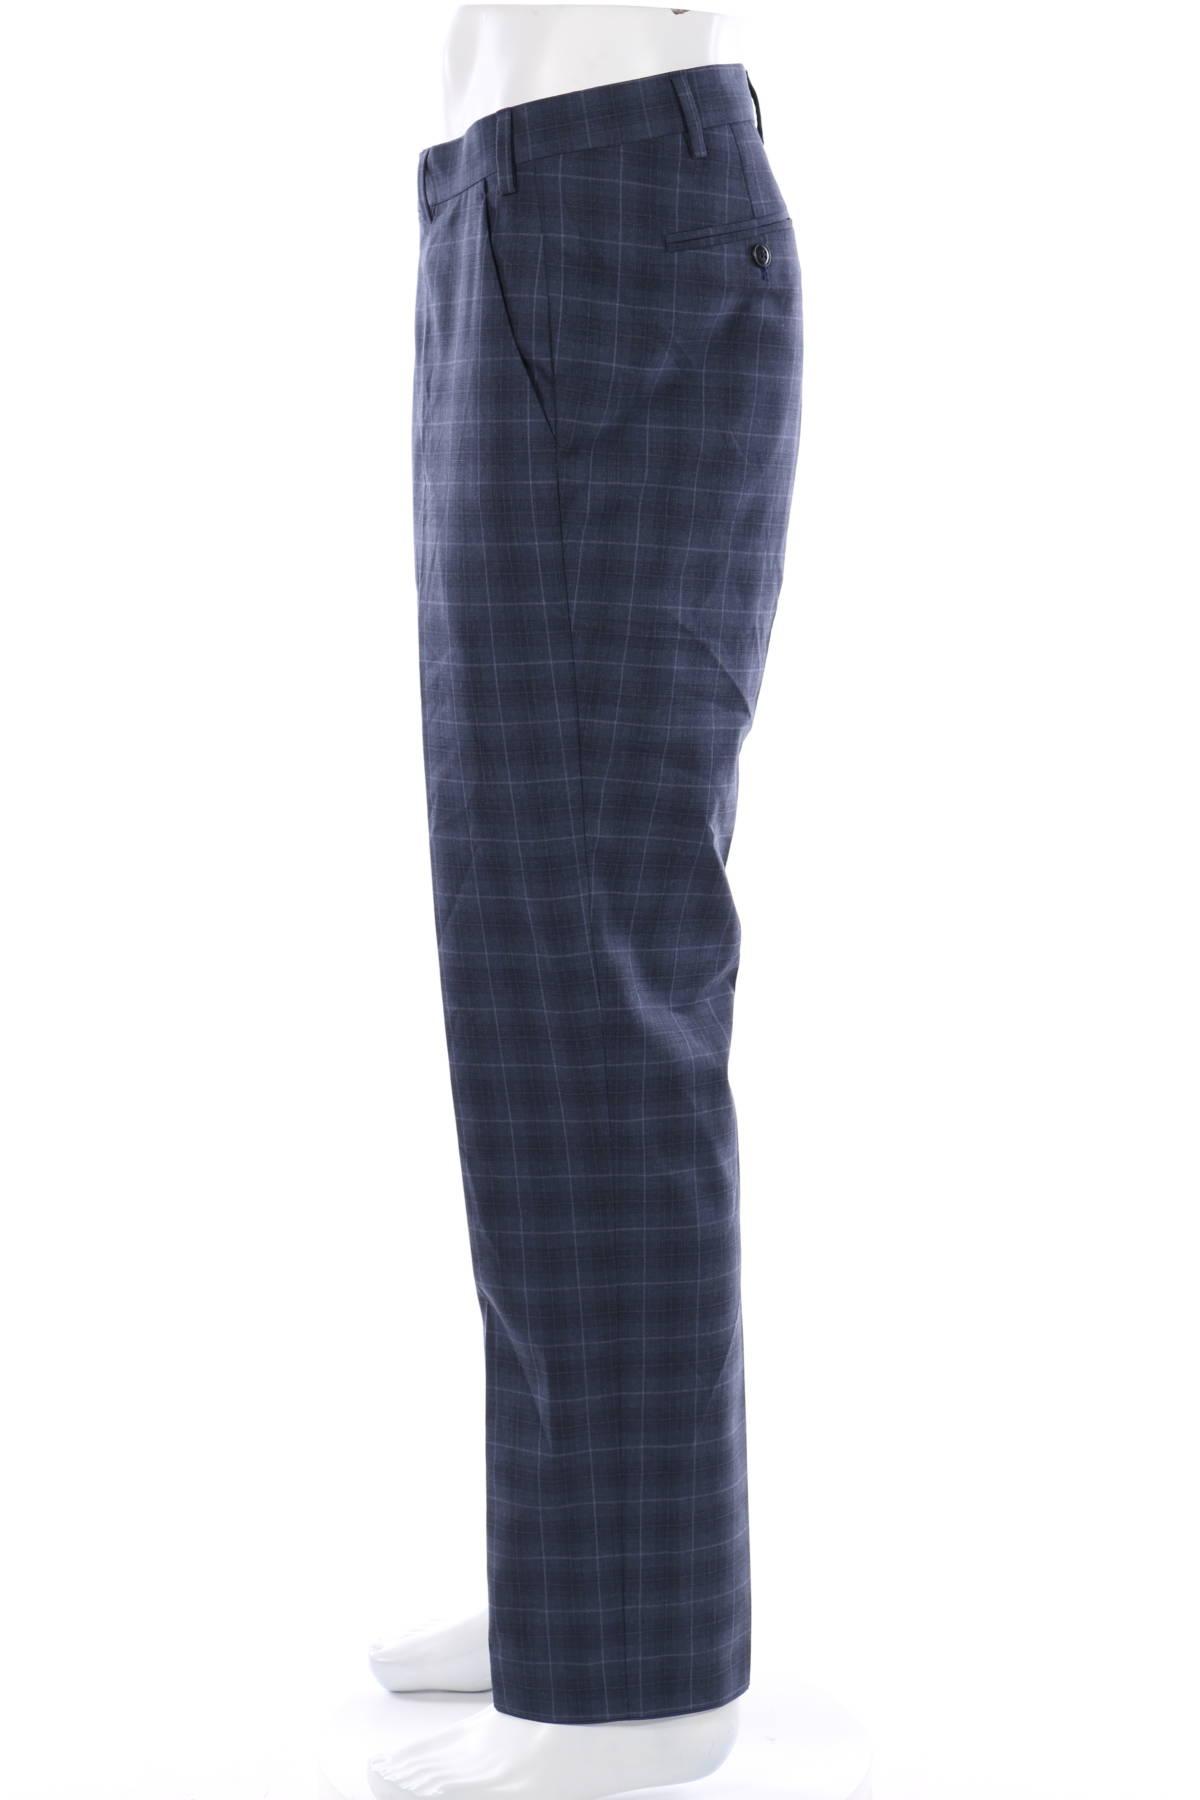 Официален панталон Christian Berg4